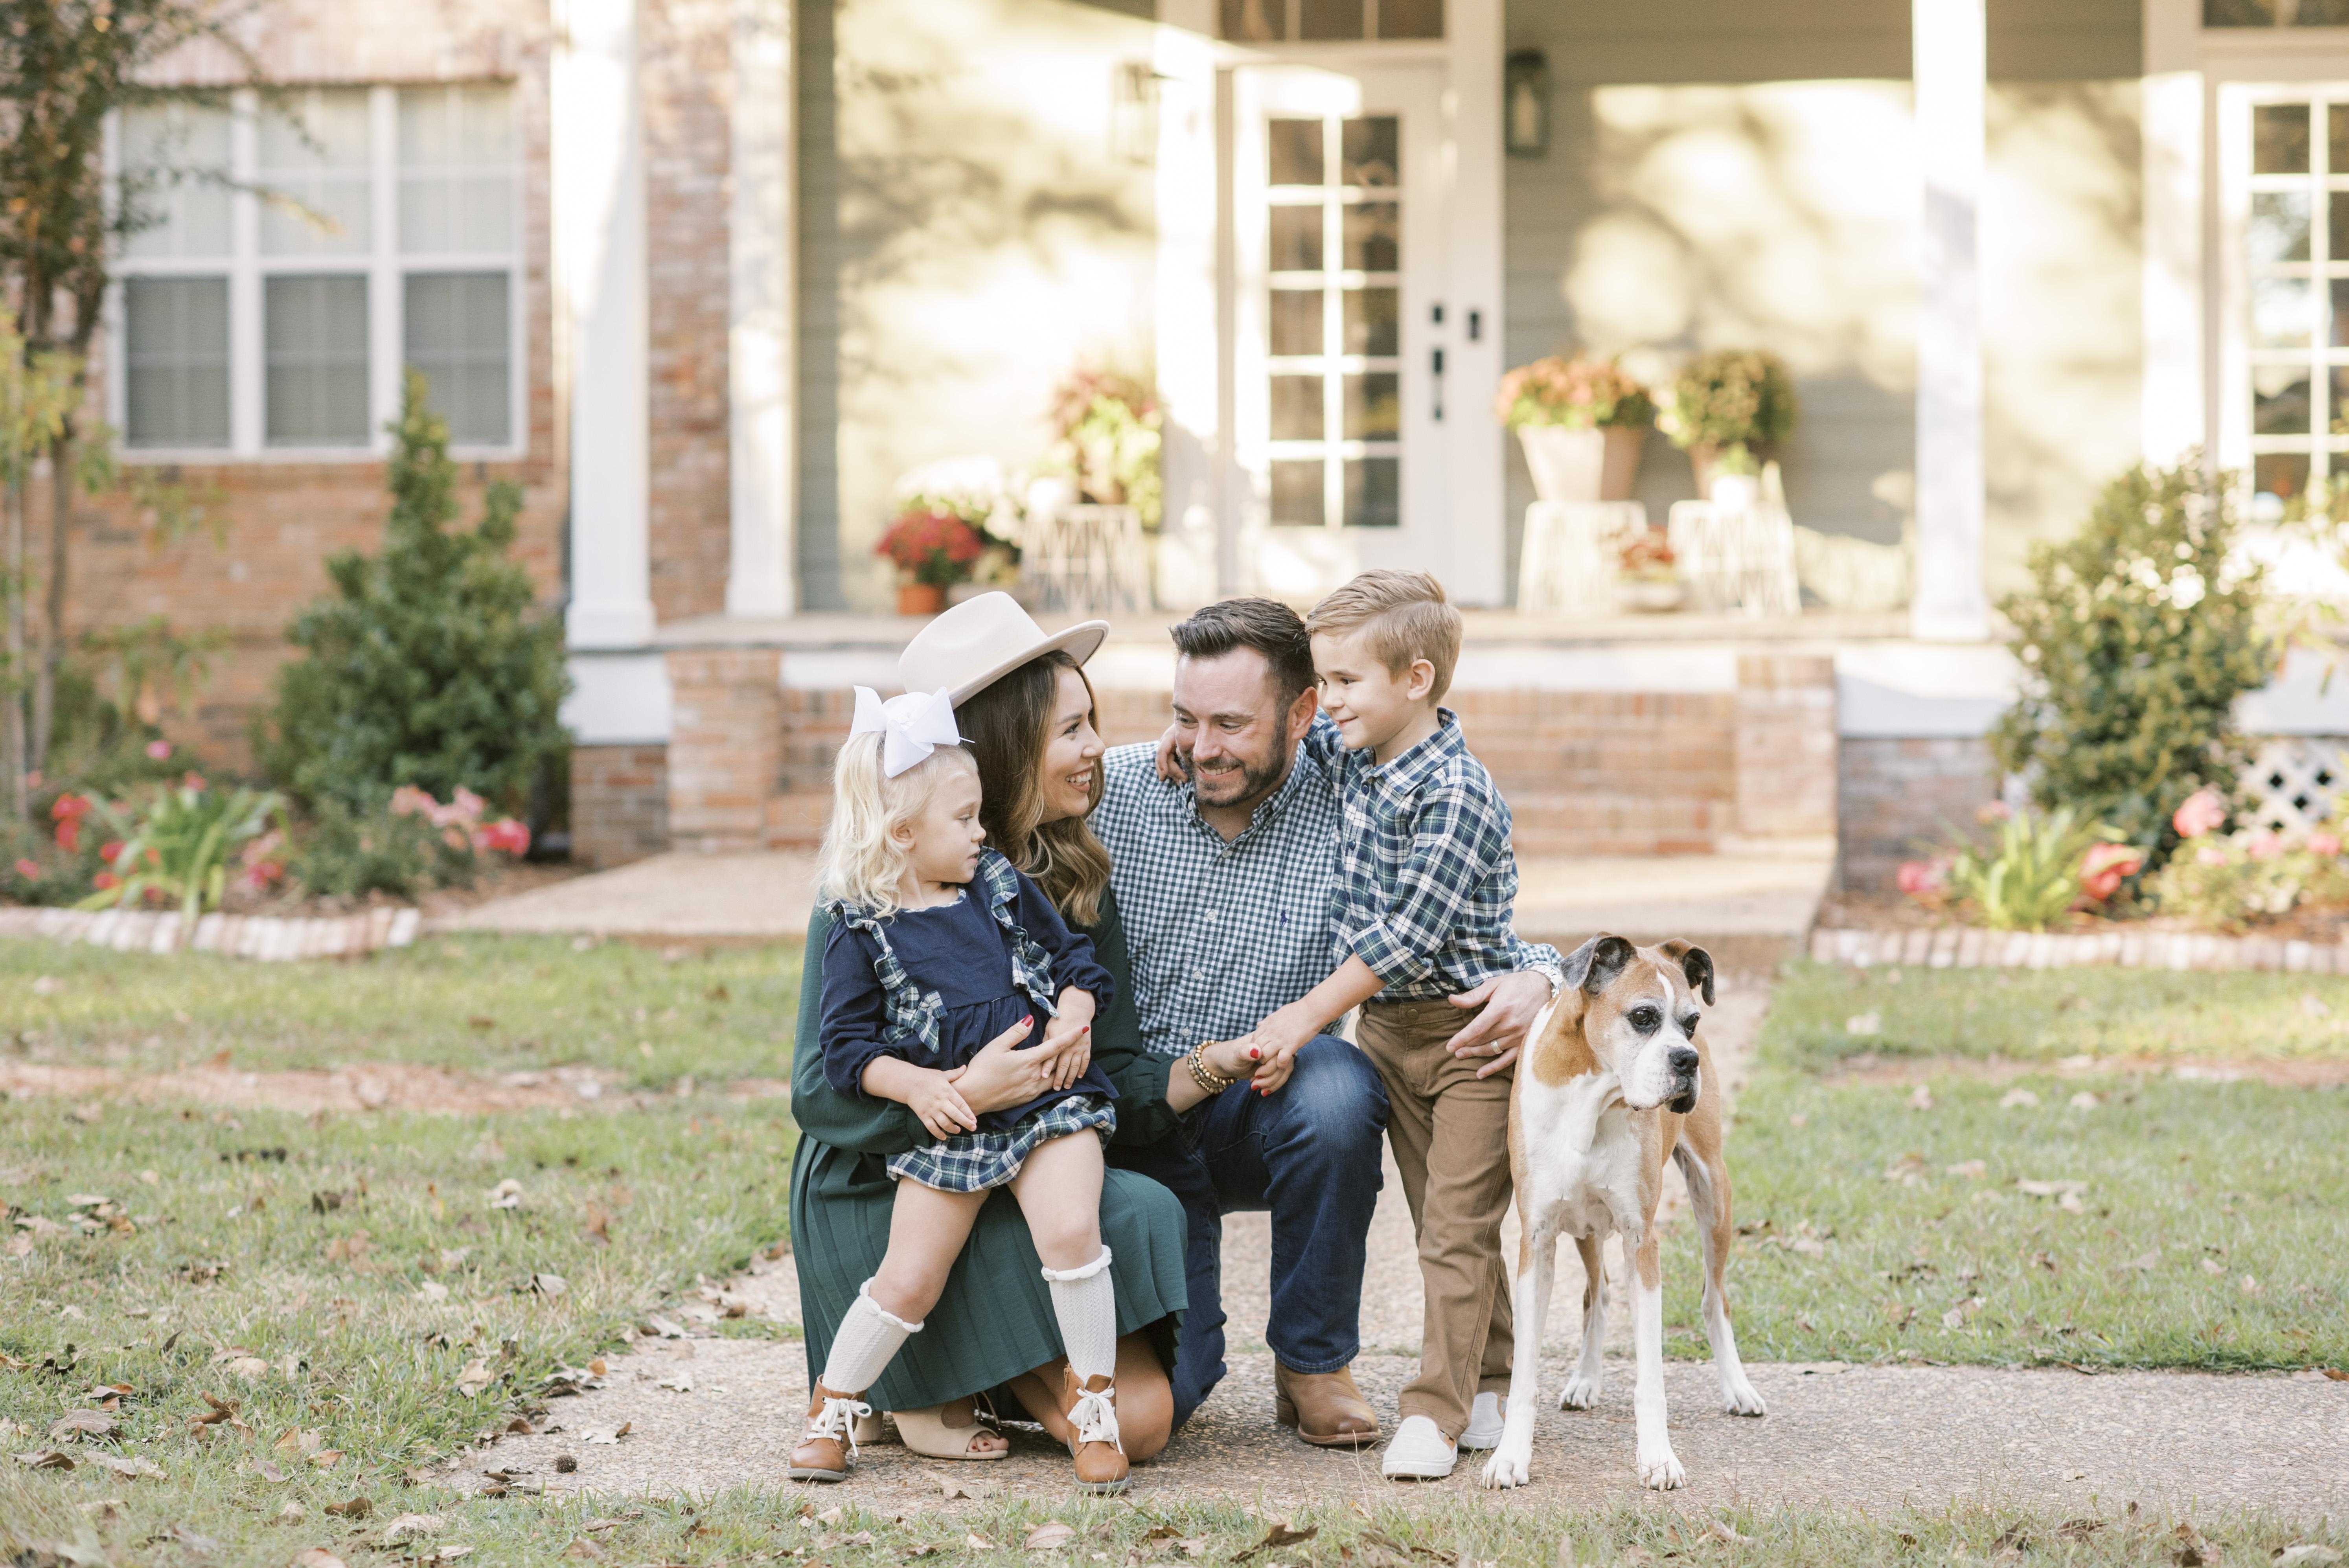 Schuldtfamily2020_004